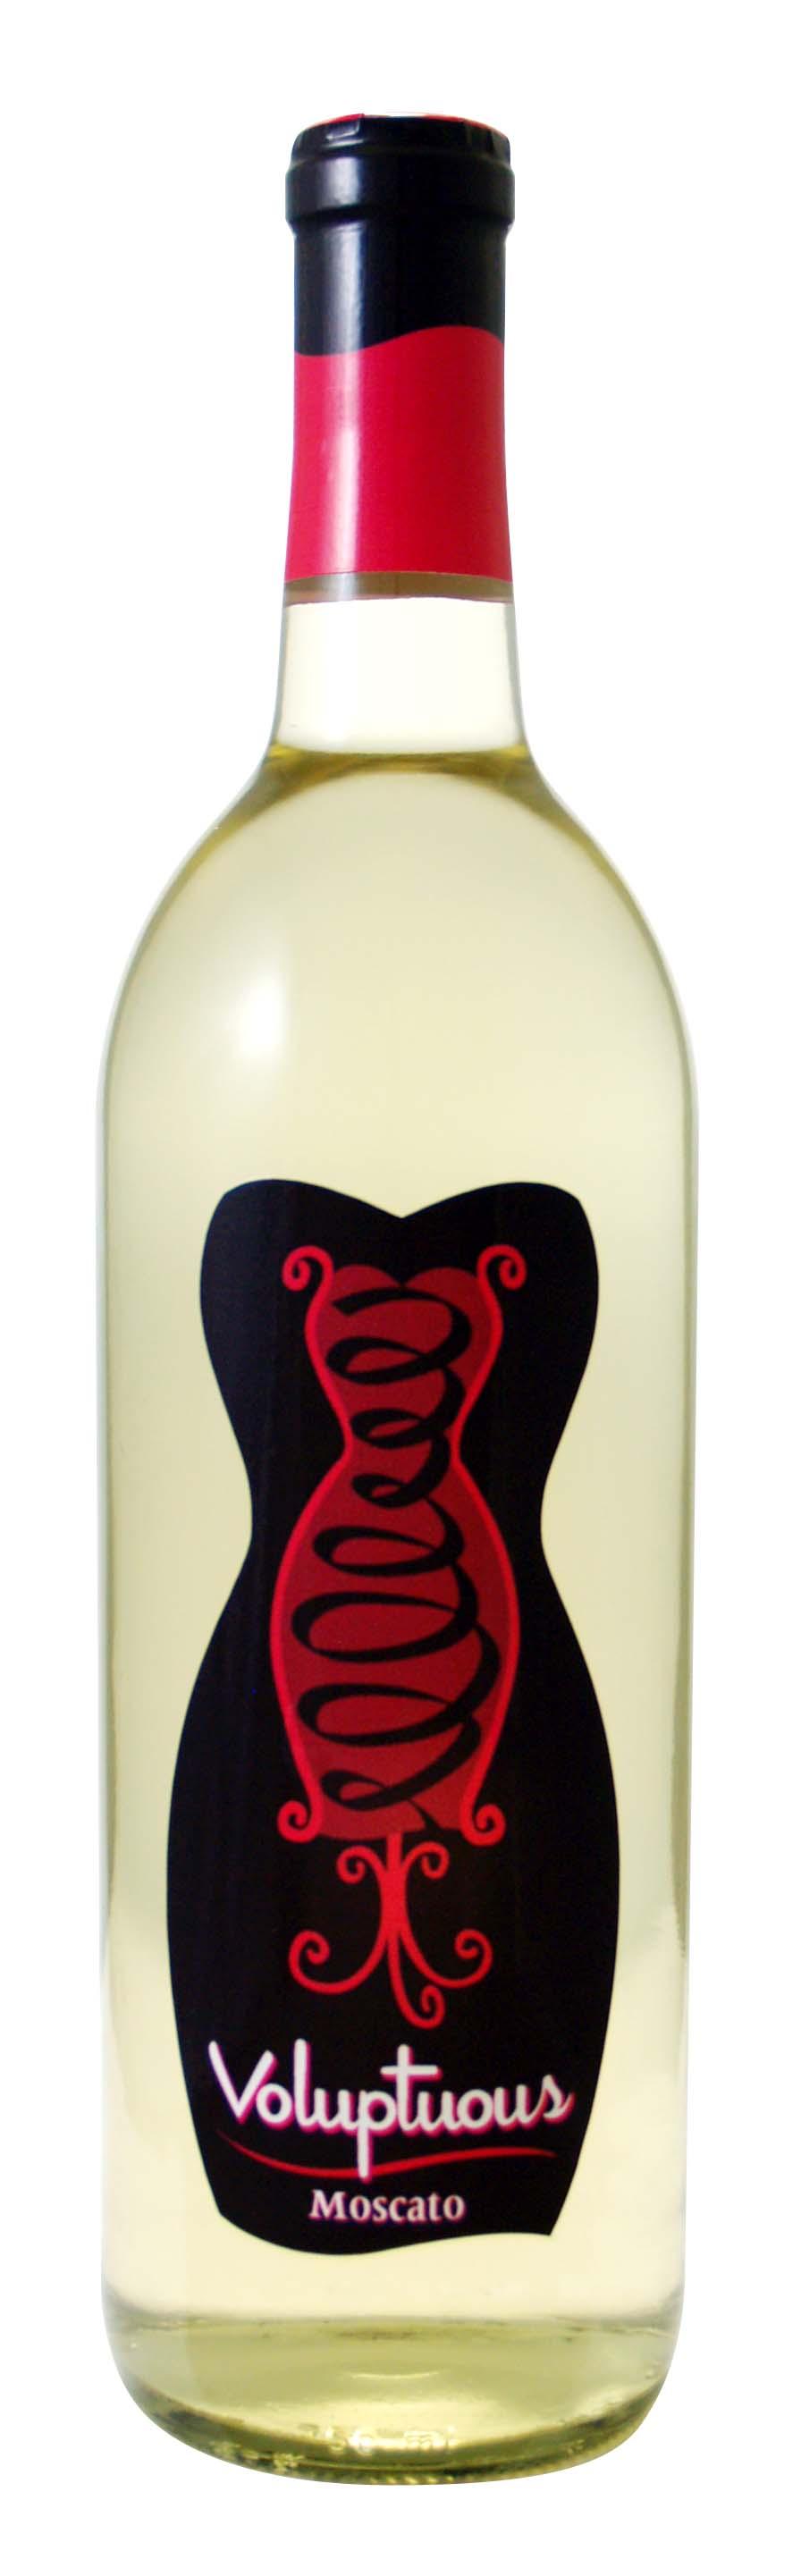 Voluptuous Moscato Wine Store Online Wine Store Wine Drinks